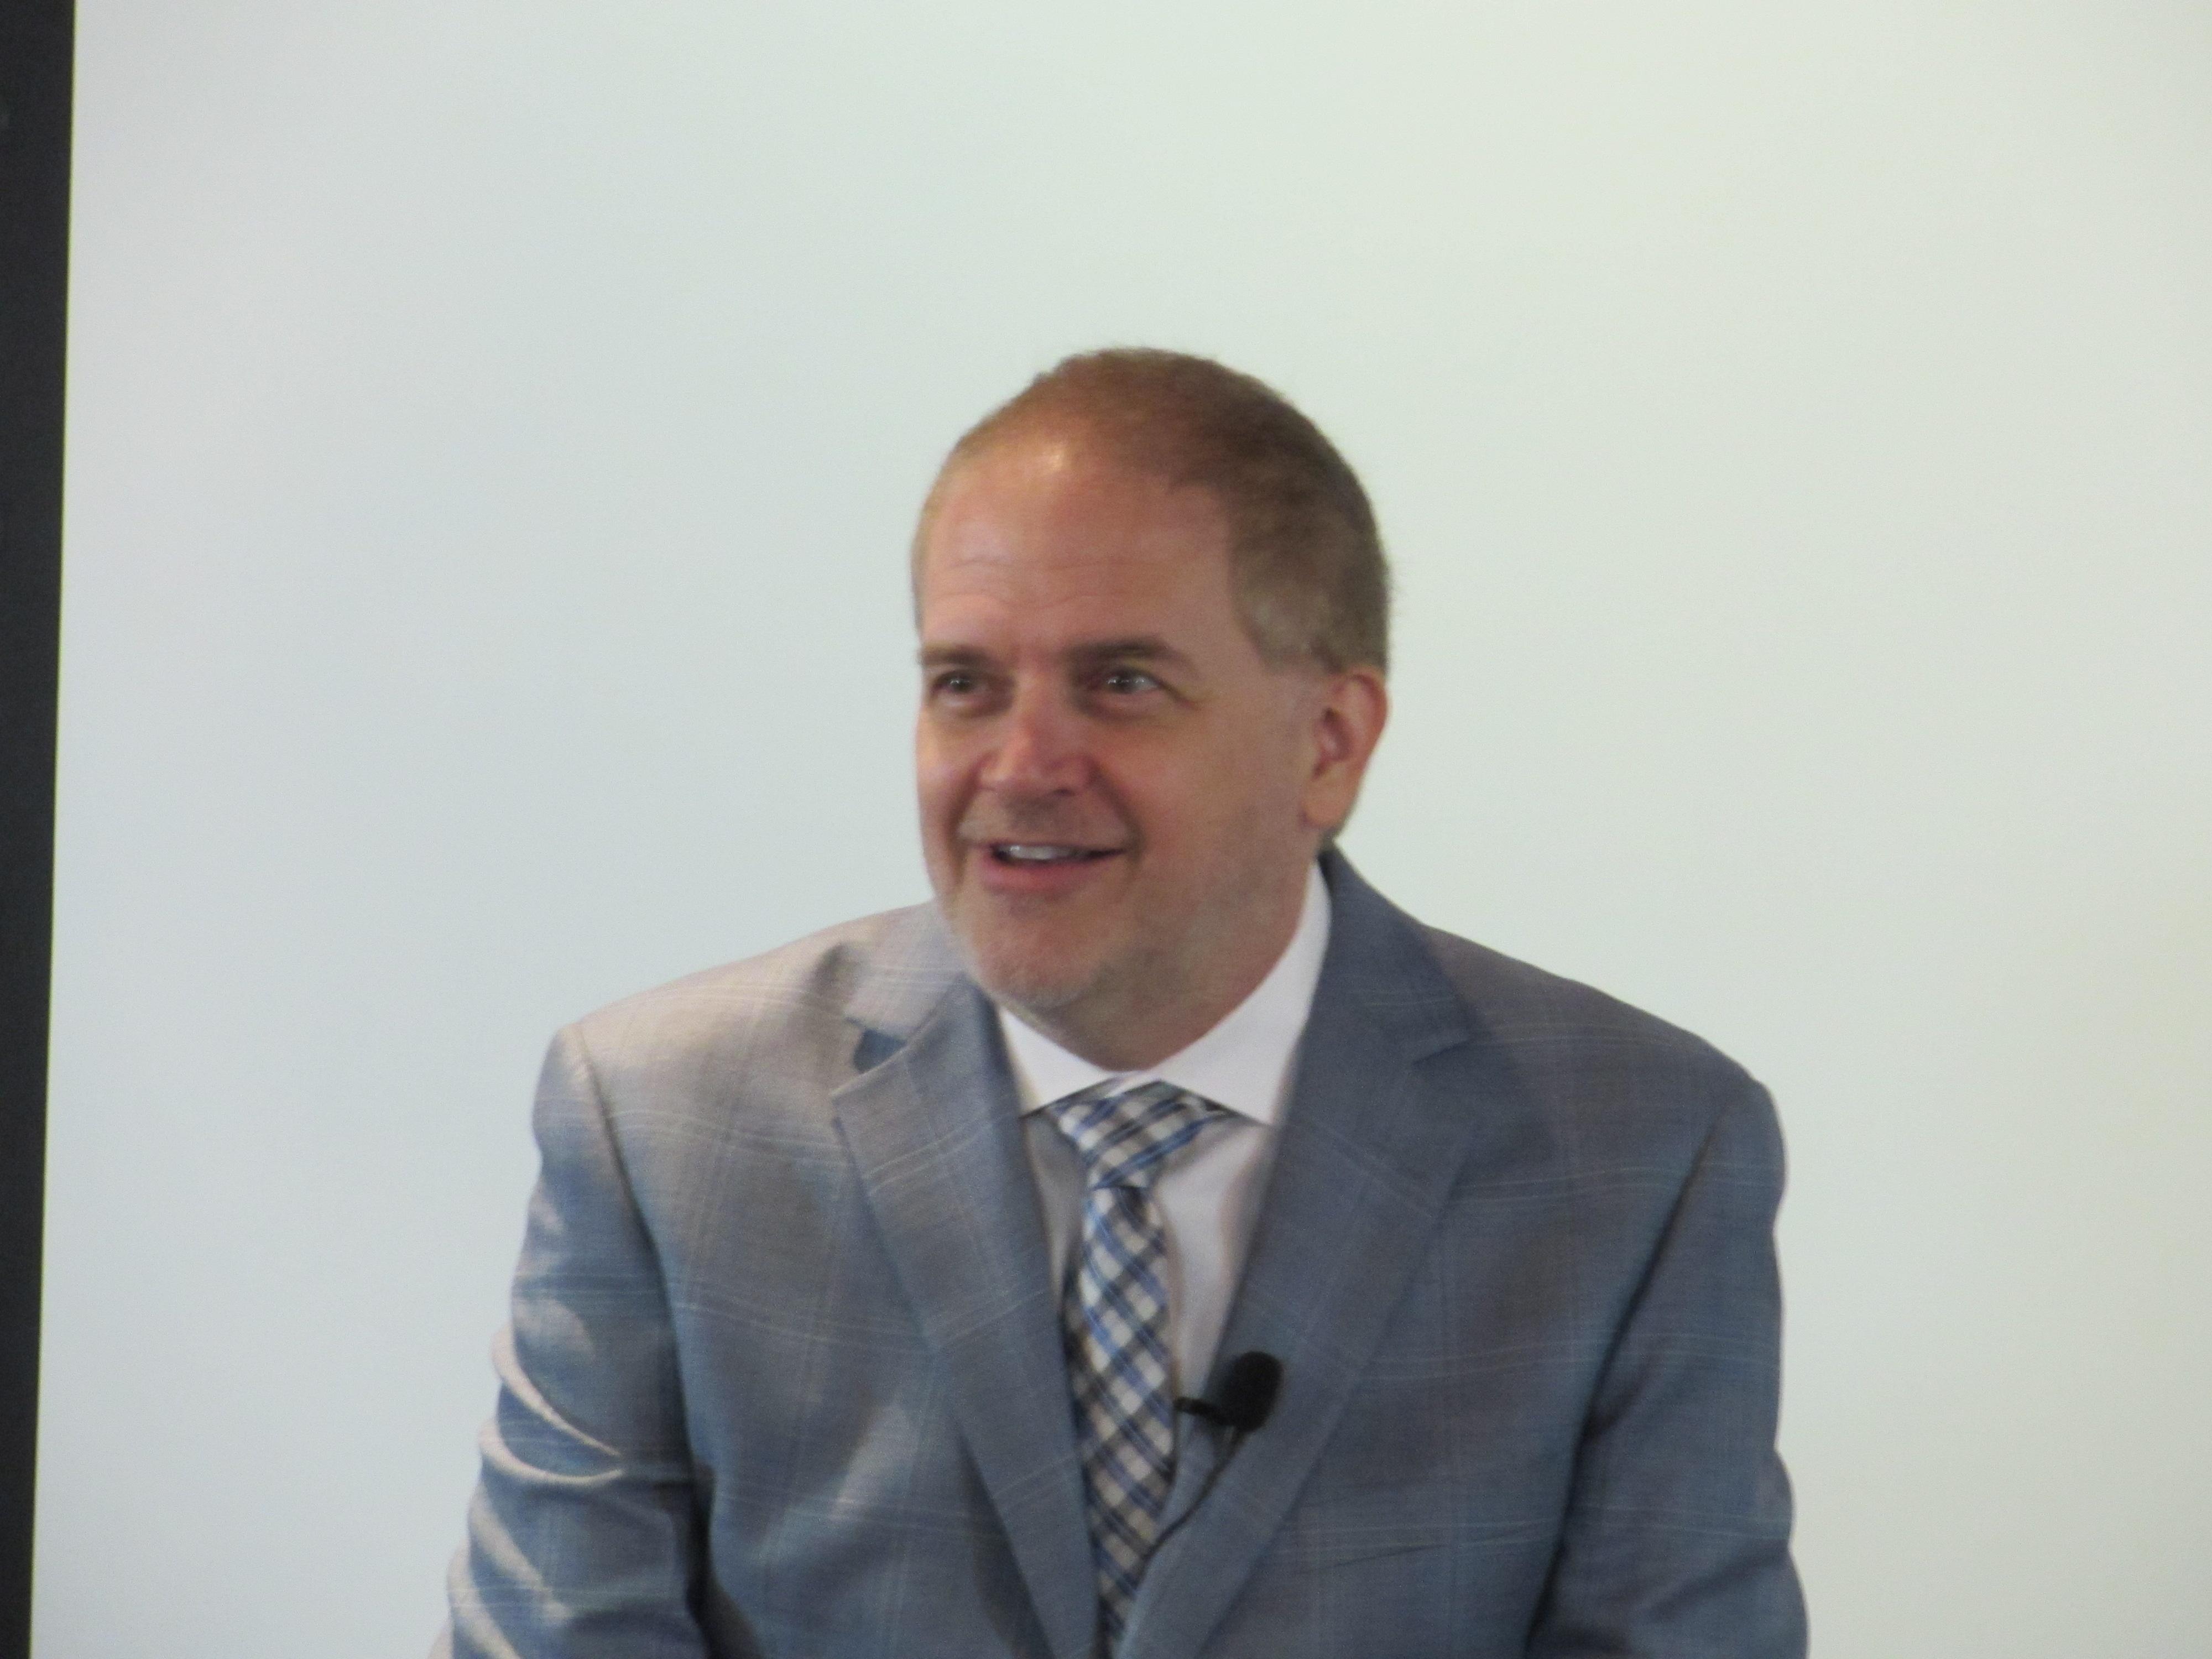 Kevin Hogan How to Persuade